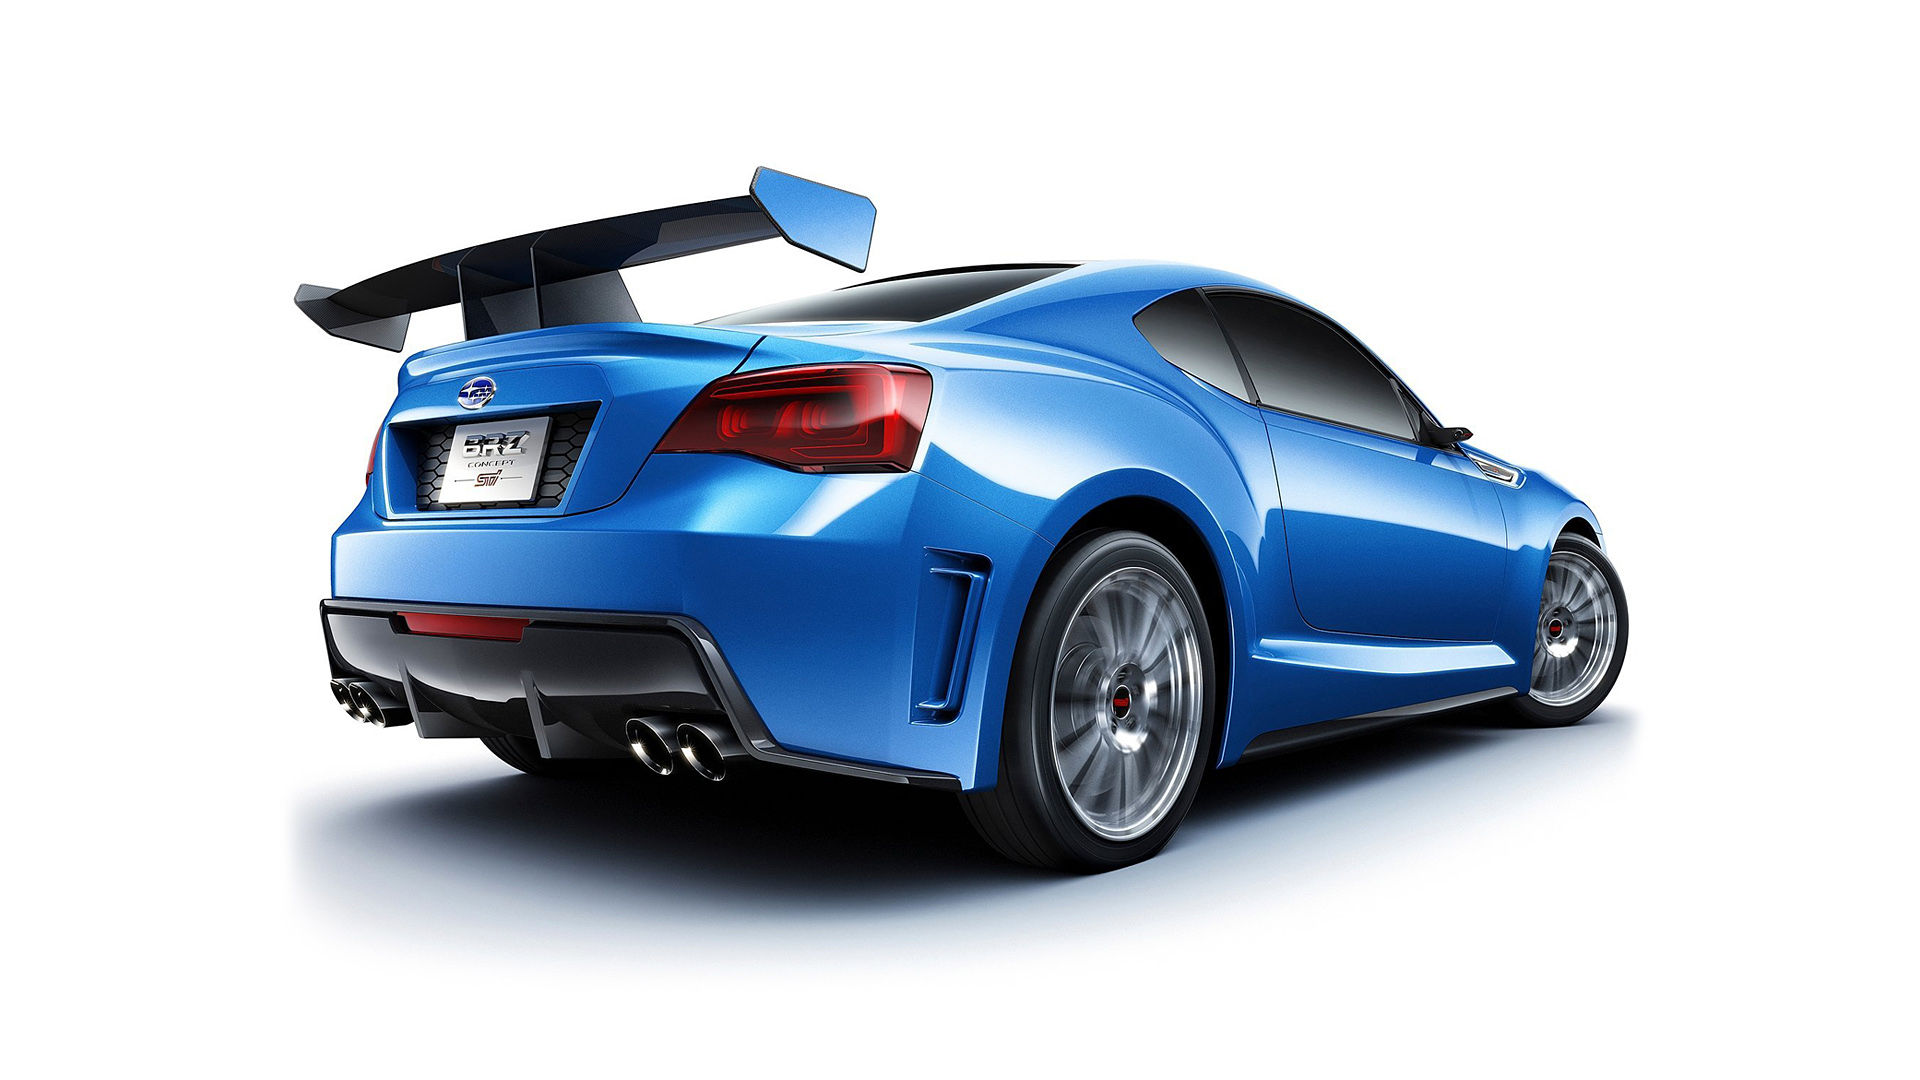 2011 Subaru BRZ STI Concept